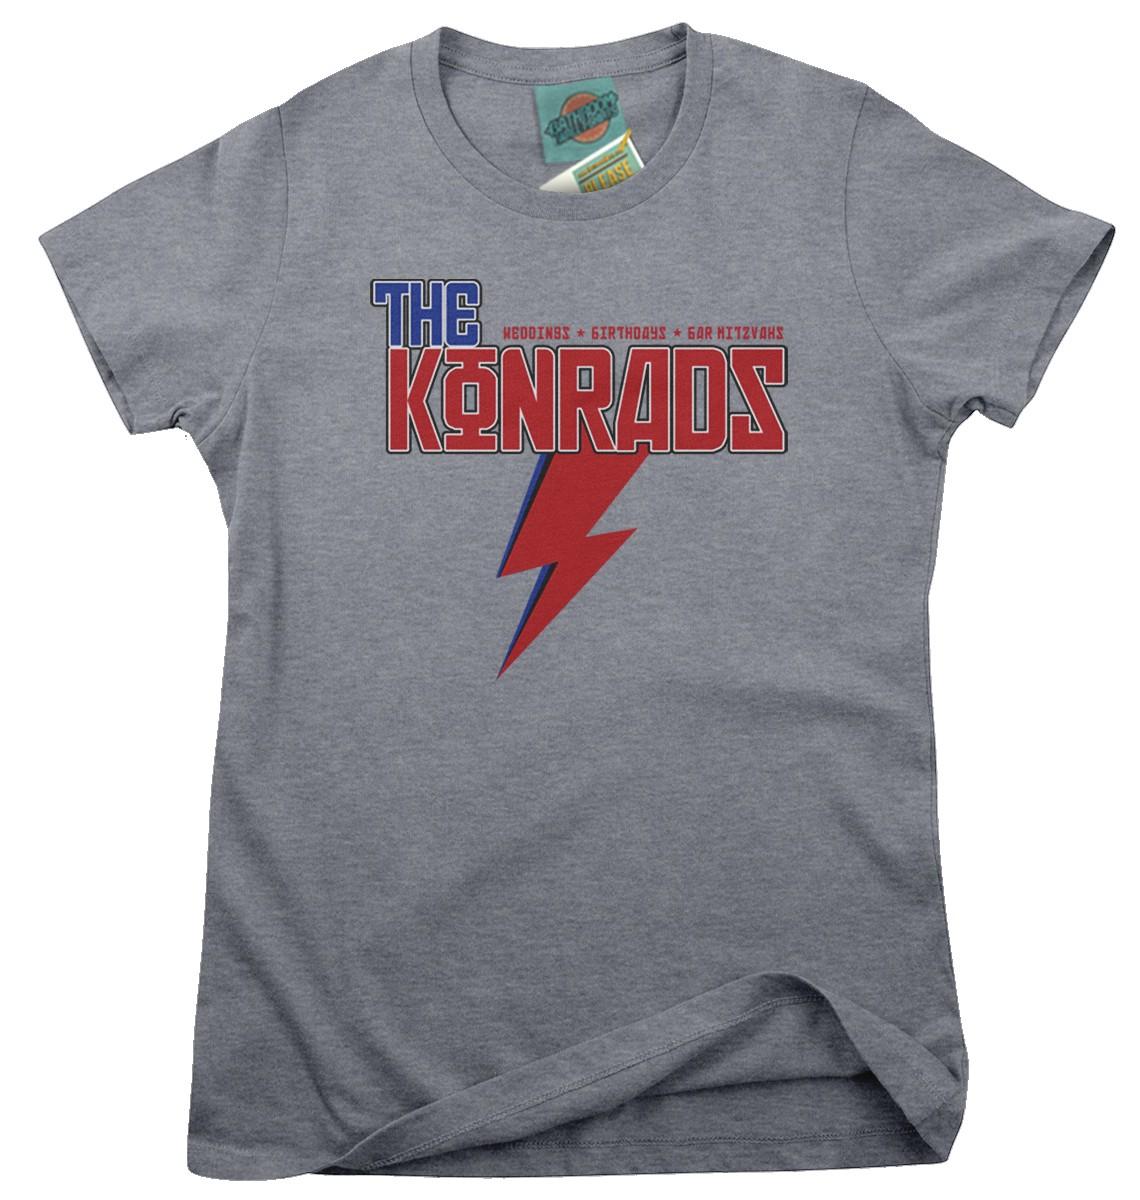 David-Bowie-inspired-The-Konrads-Femmes-T-Shirt